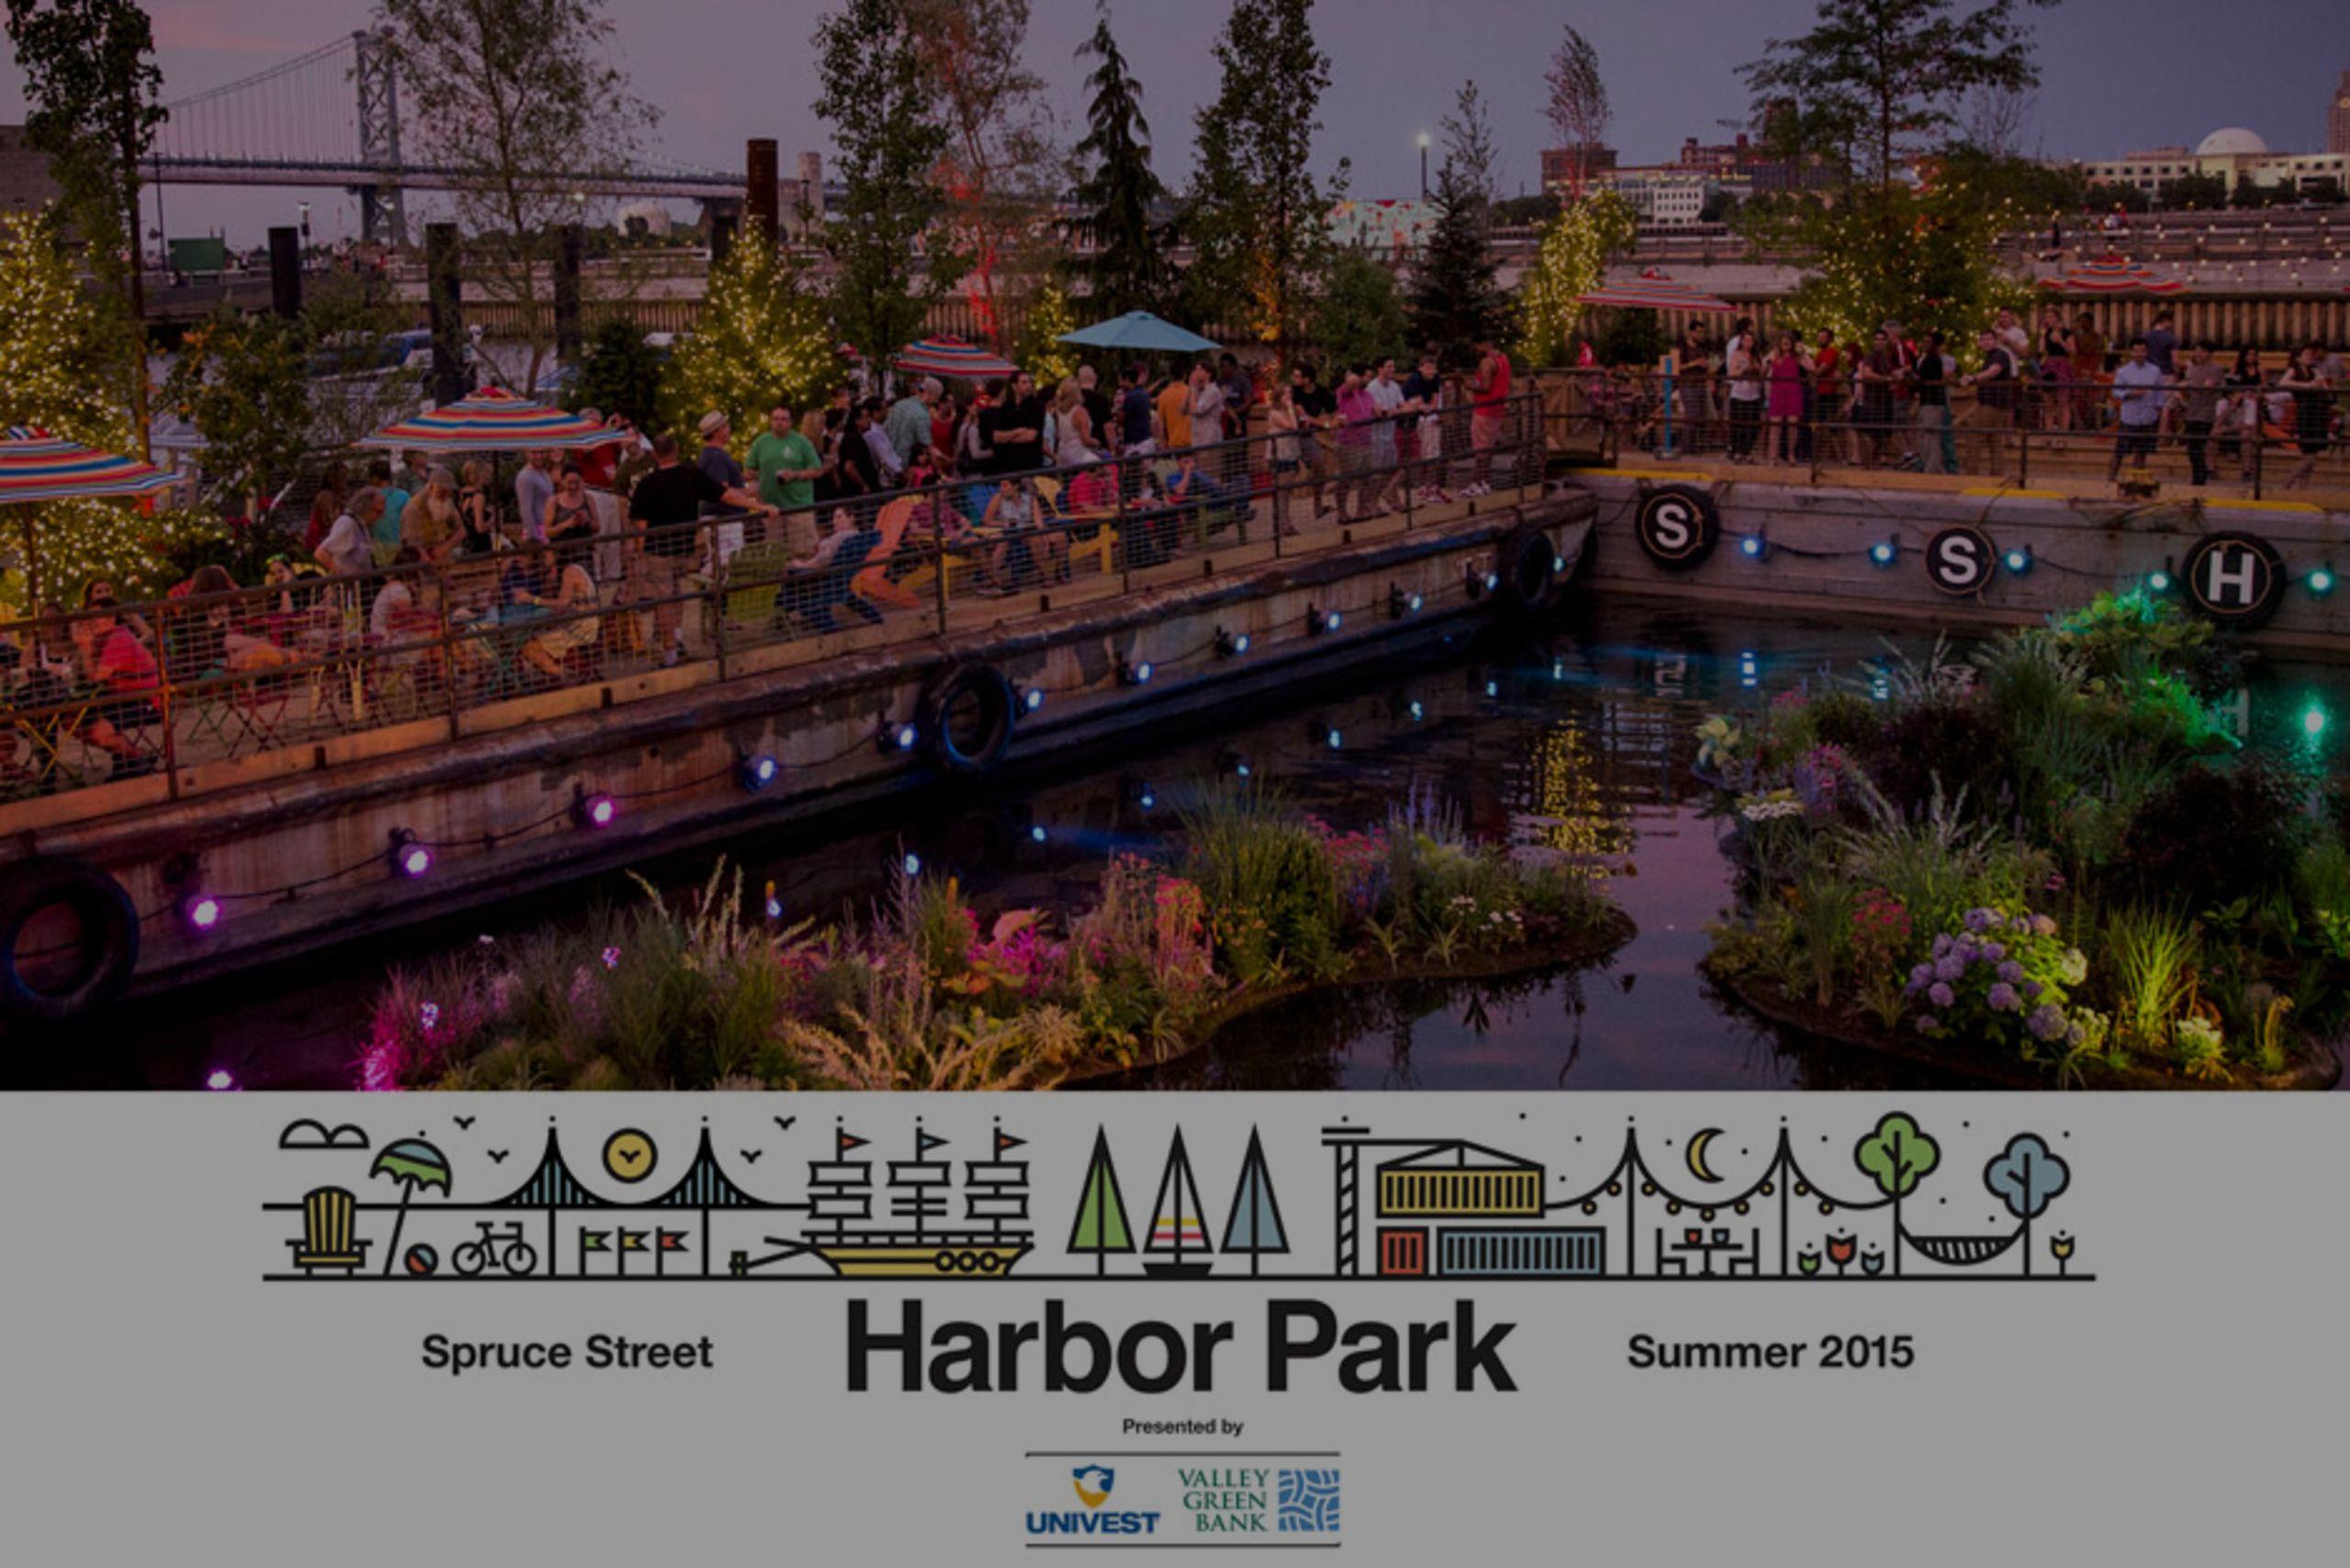 Spruce Street Harbor Park is returning soon!